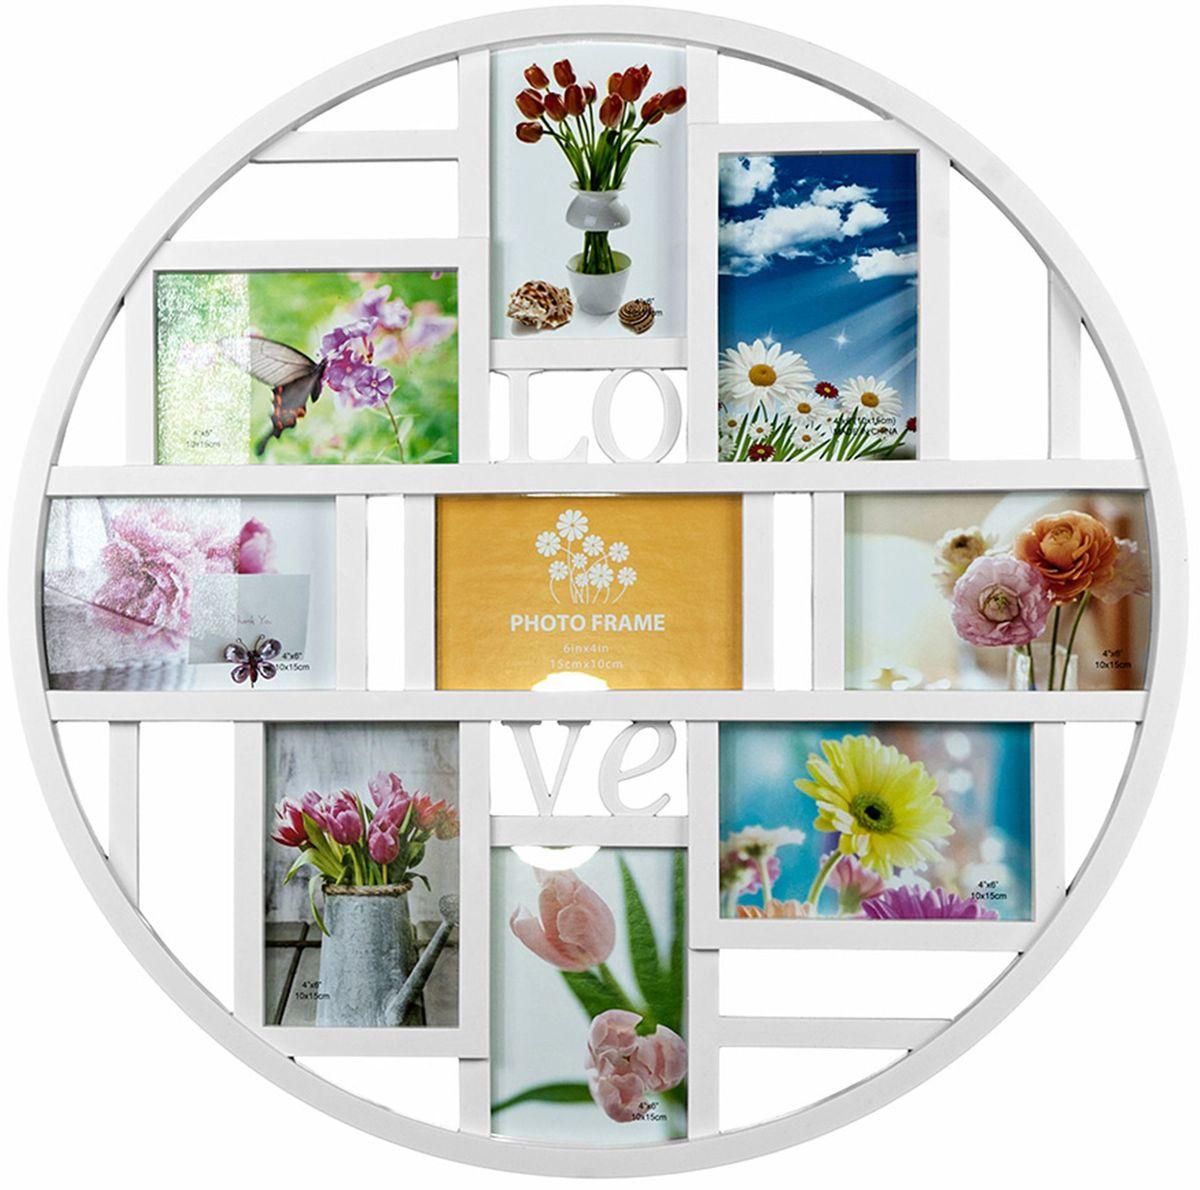 Коллаж Platinum Love, цвет: белый, 9 фоторамок. BIN-1123356BIN-1123356-White-БелыйПластиковый коллаж с 9 фото 10х15 см.